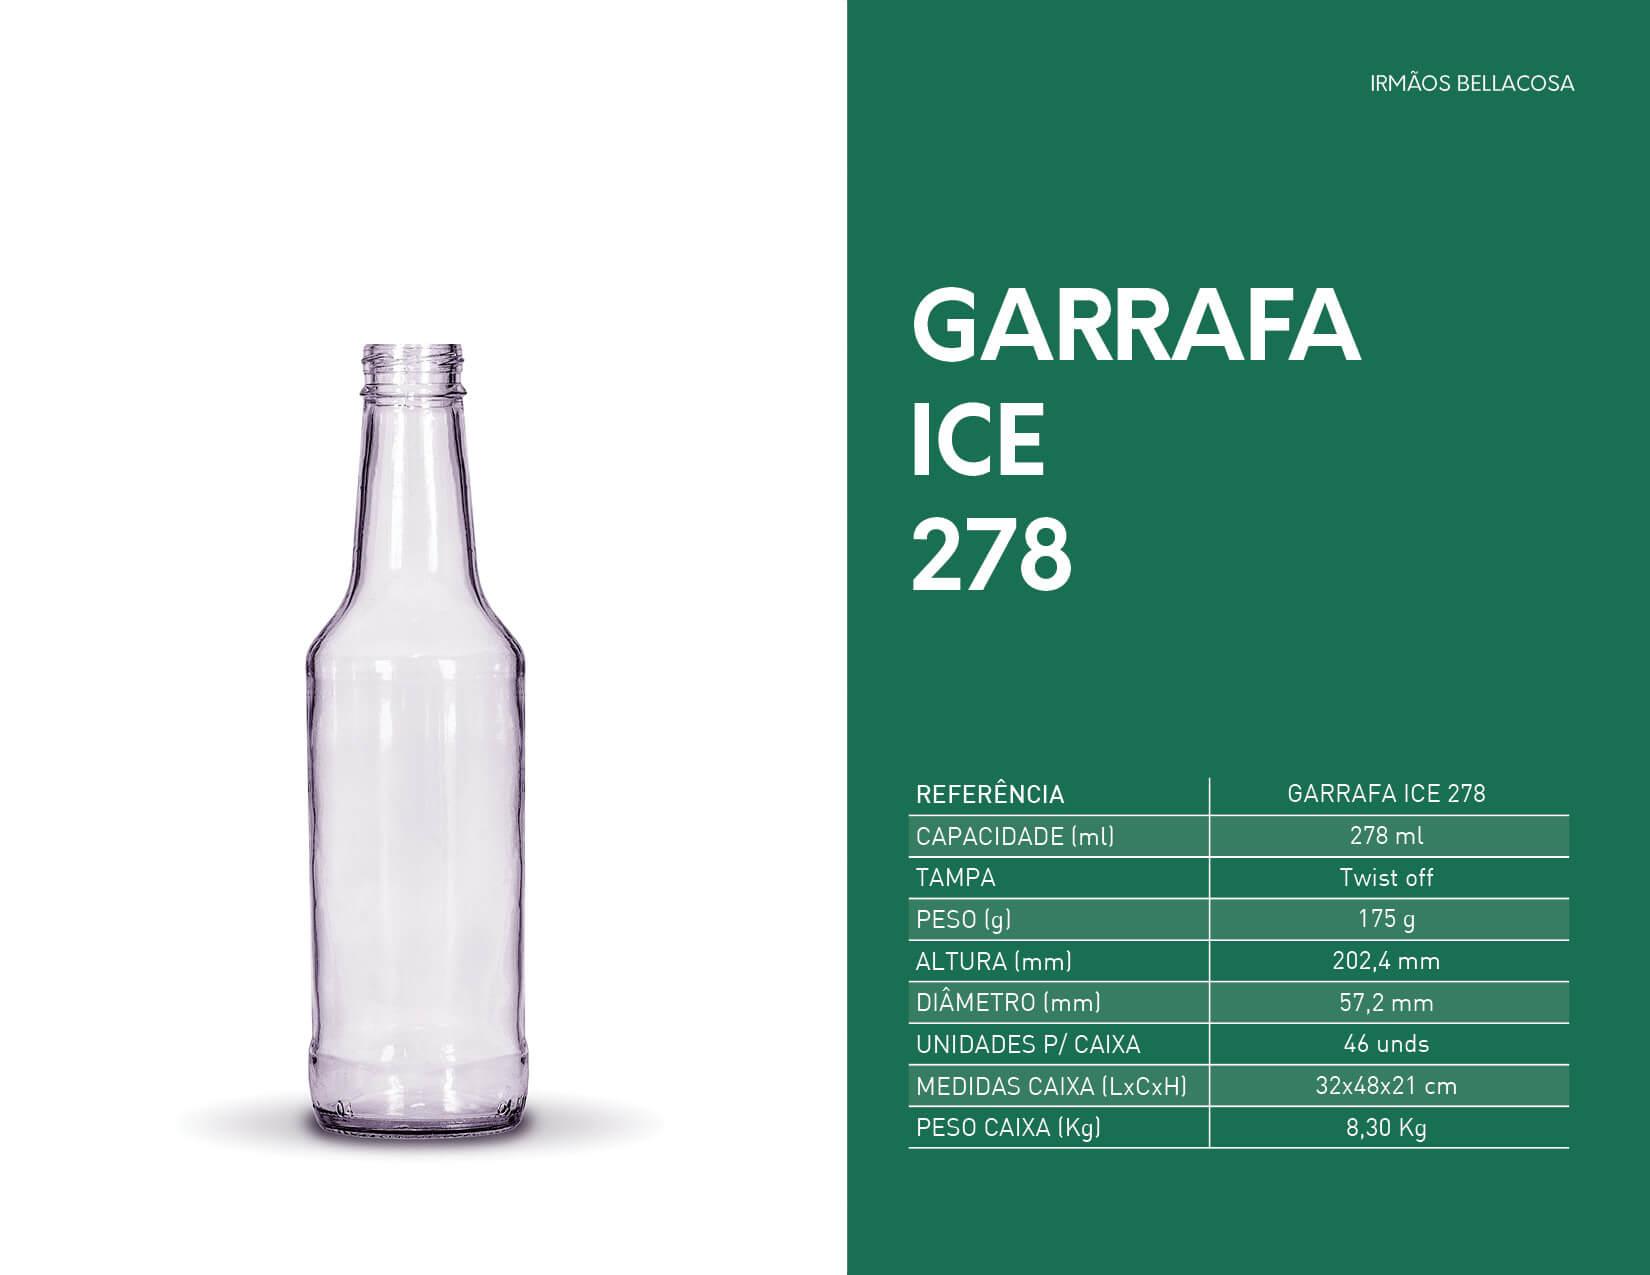 047-Garrafa-Ice-278-irmaos-bellacosa-embalagens-de-vidro